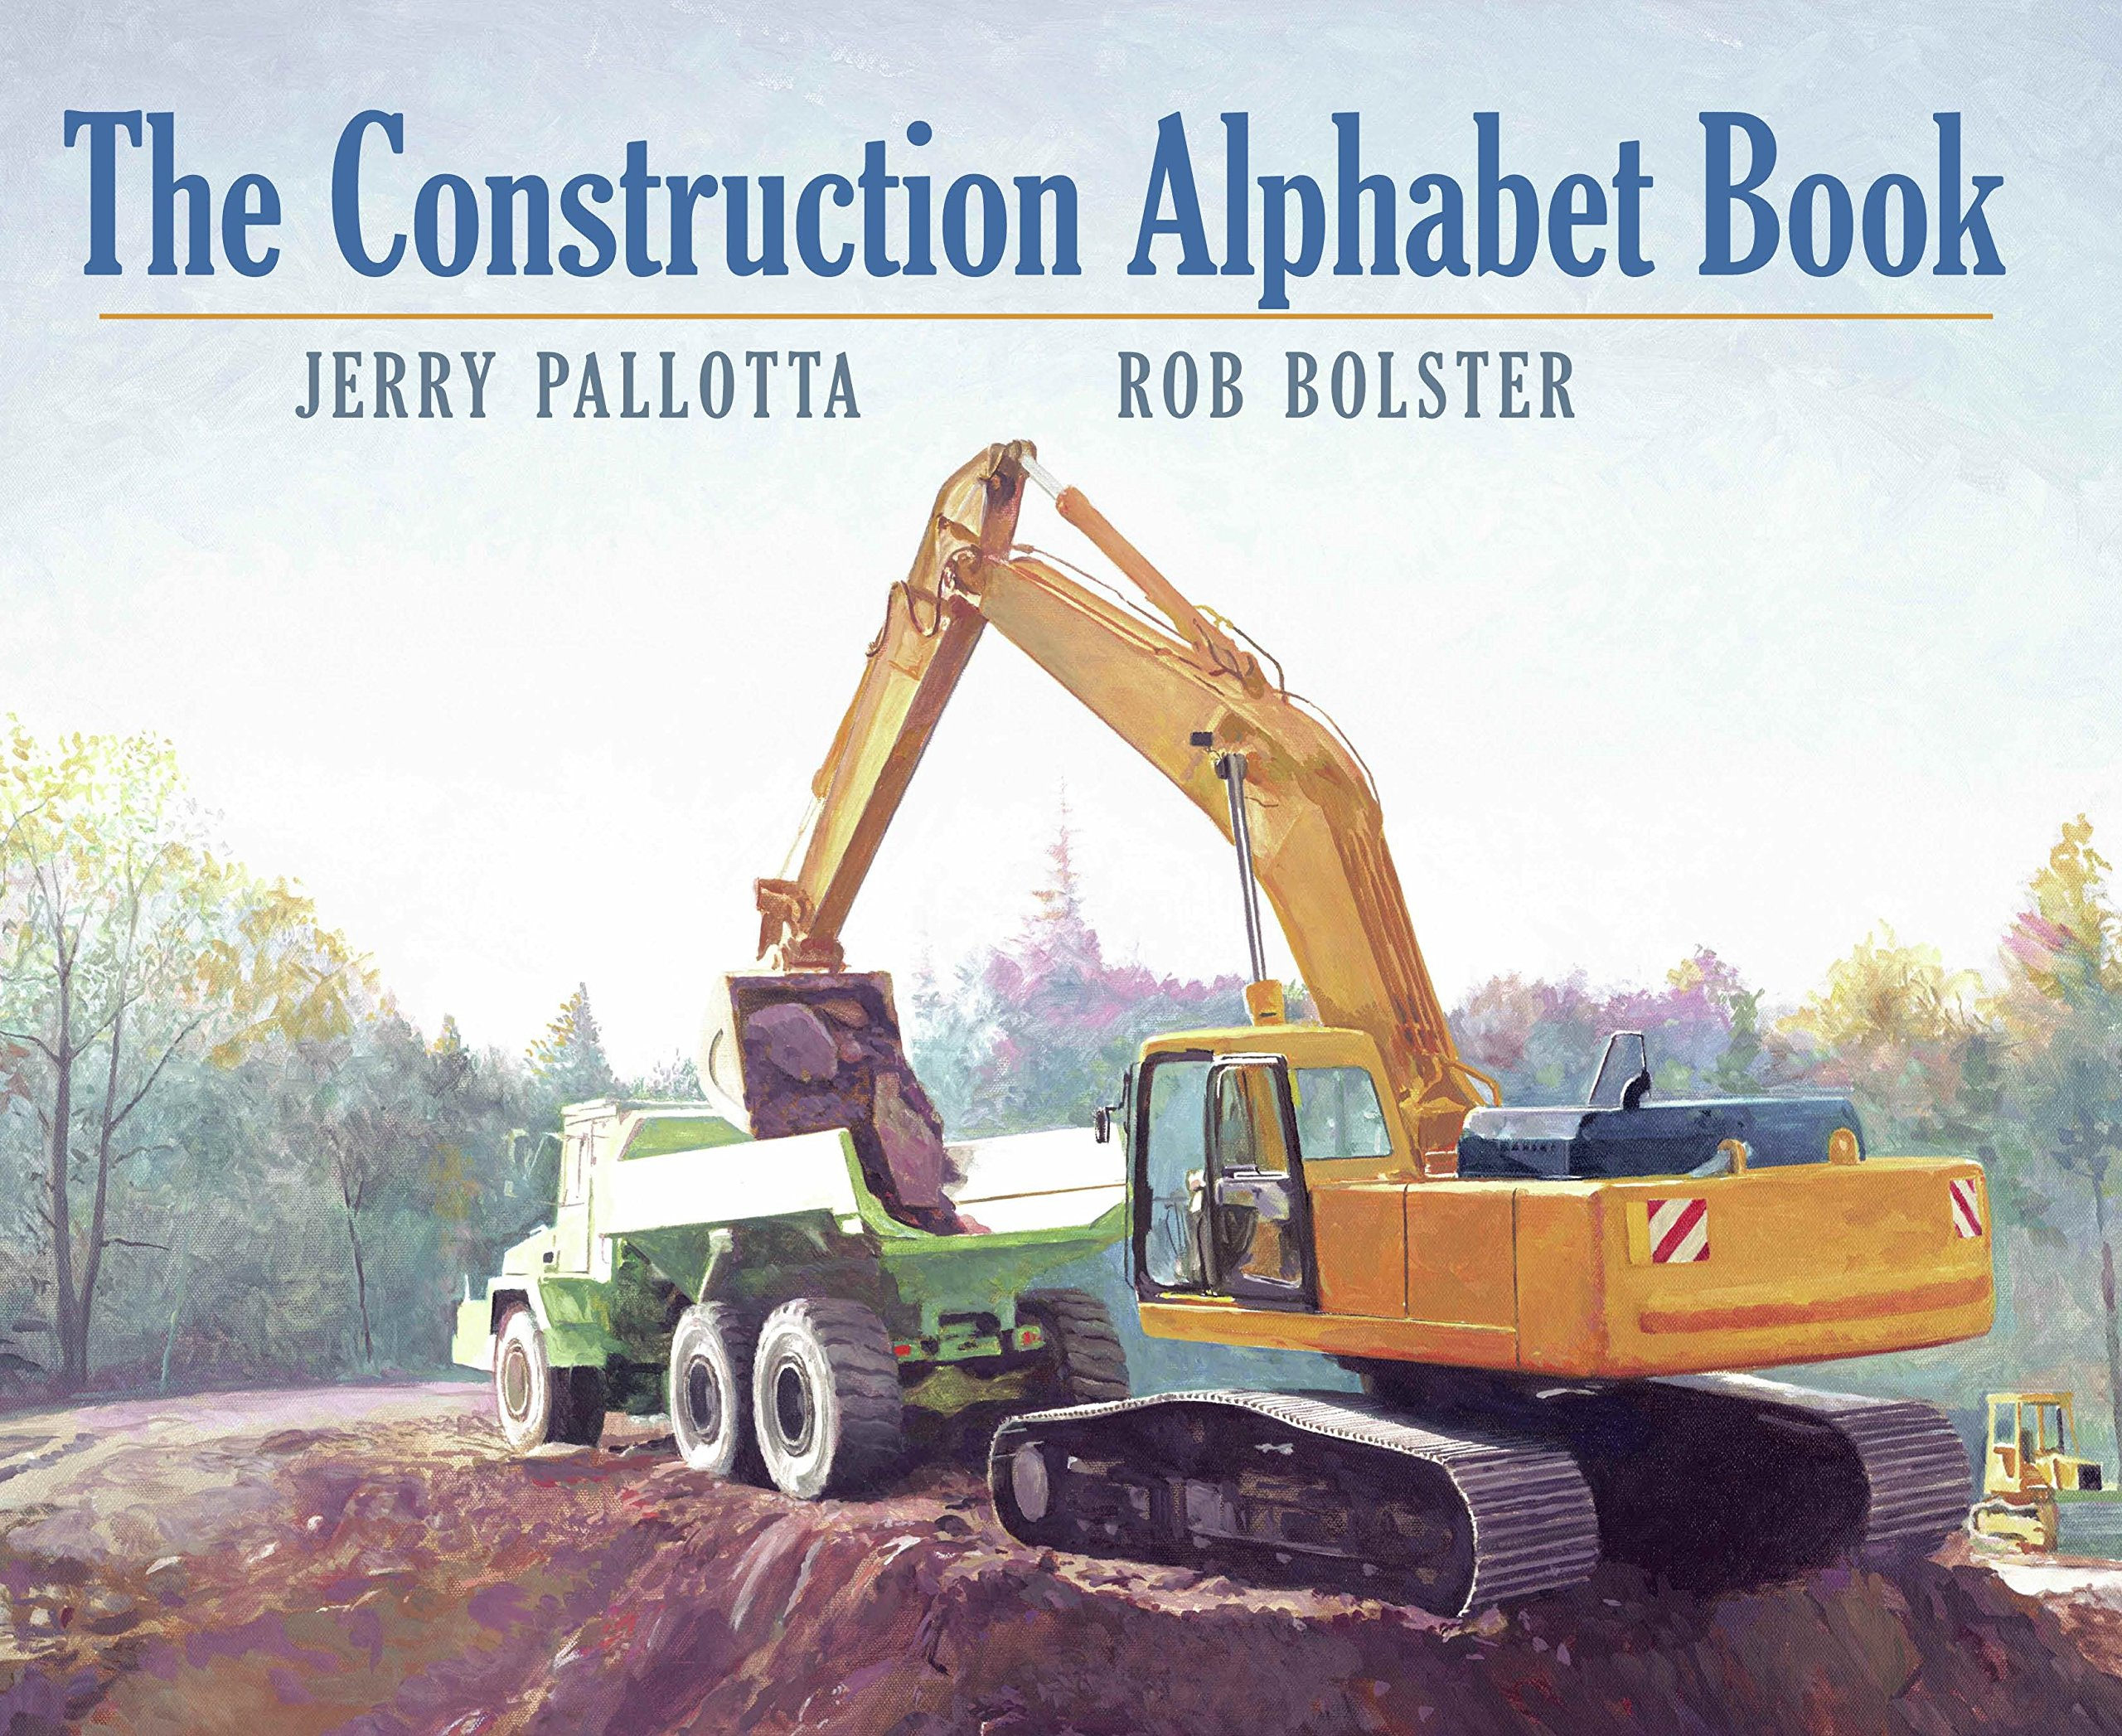 The Construction Alphabet Book (Jerry Pallotta's Alphabet Books) by Charlesbridge+ Publishing